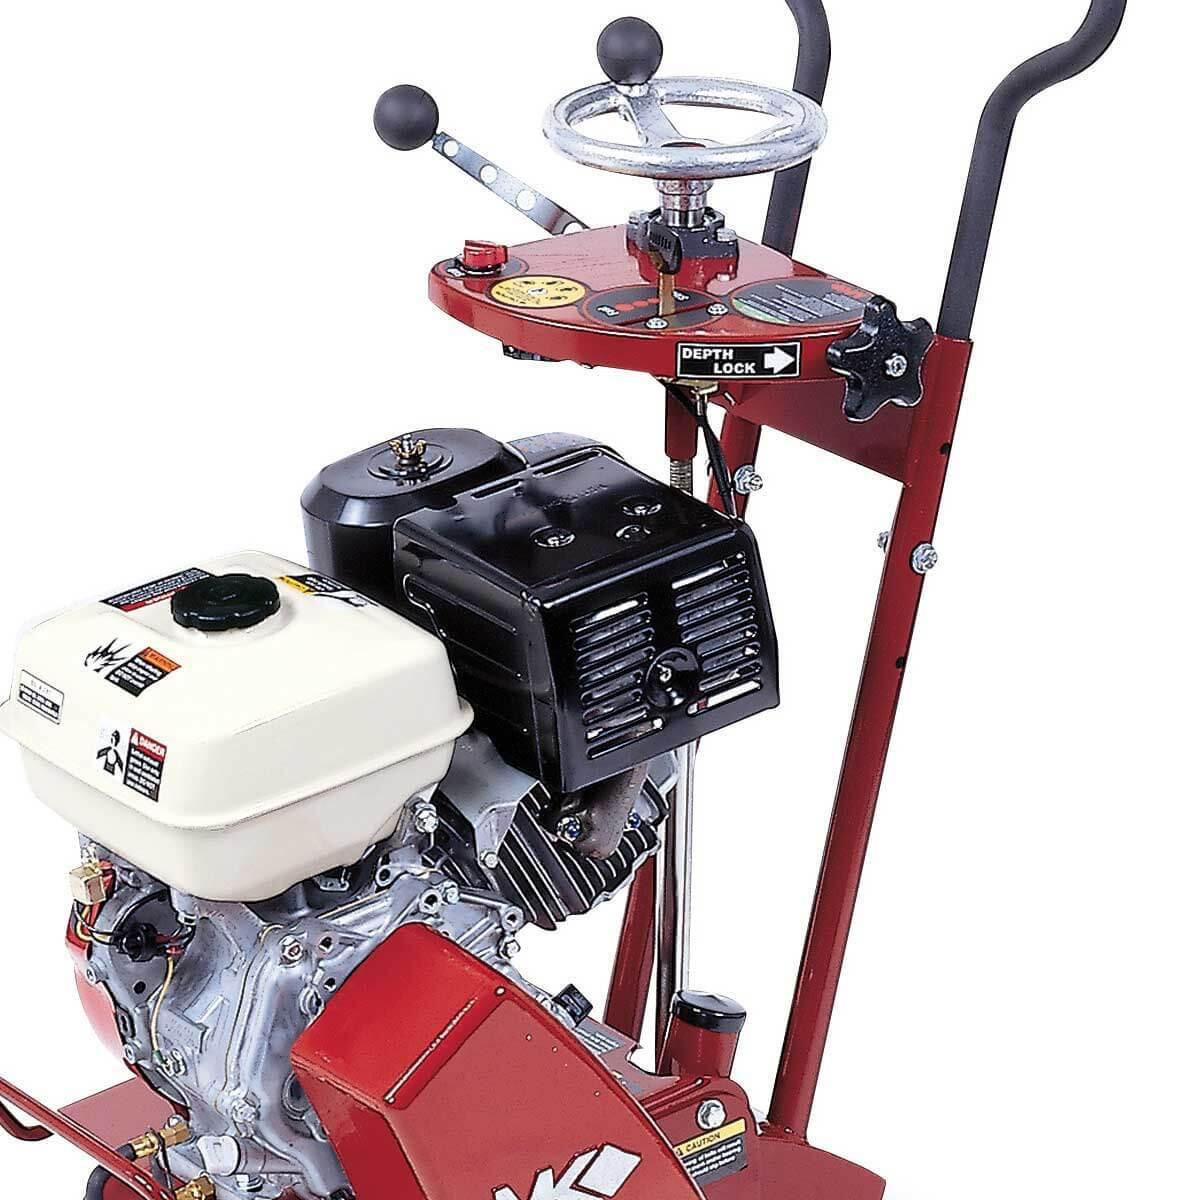 MK-SG-9 Honda Gas Scarifier